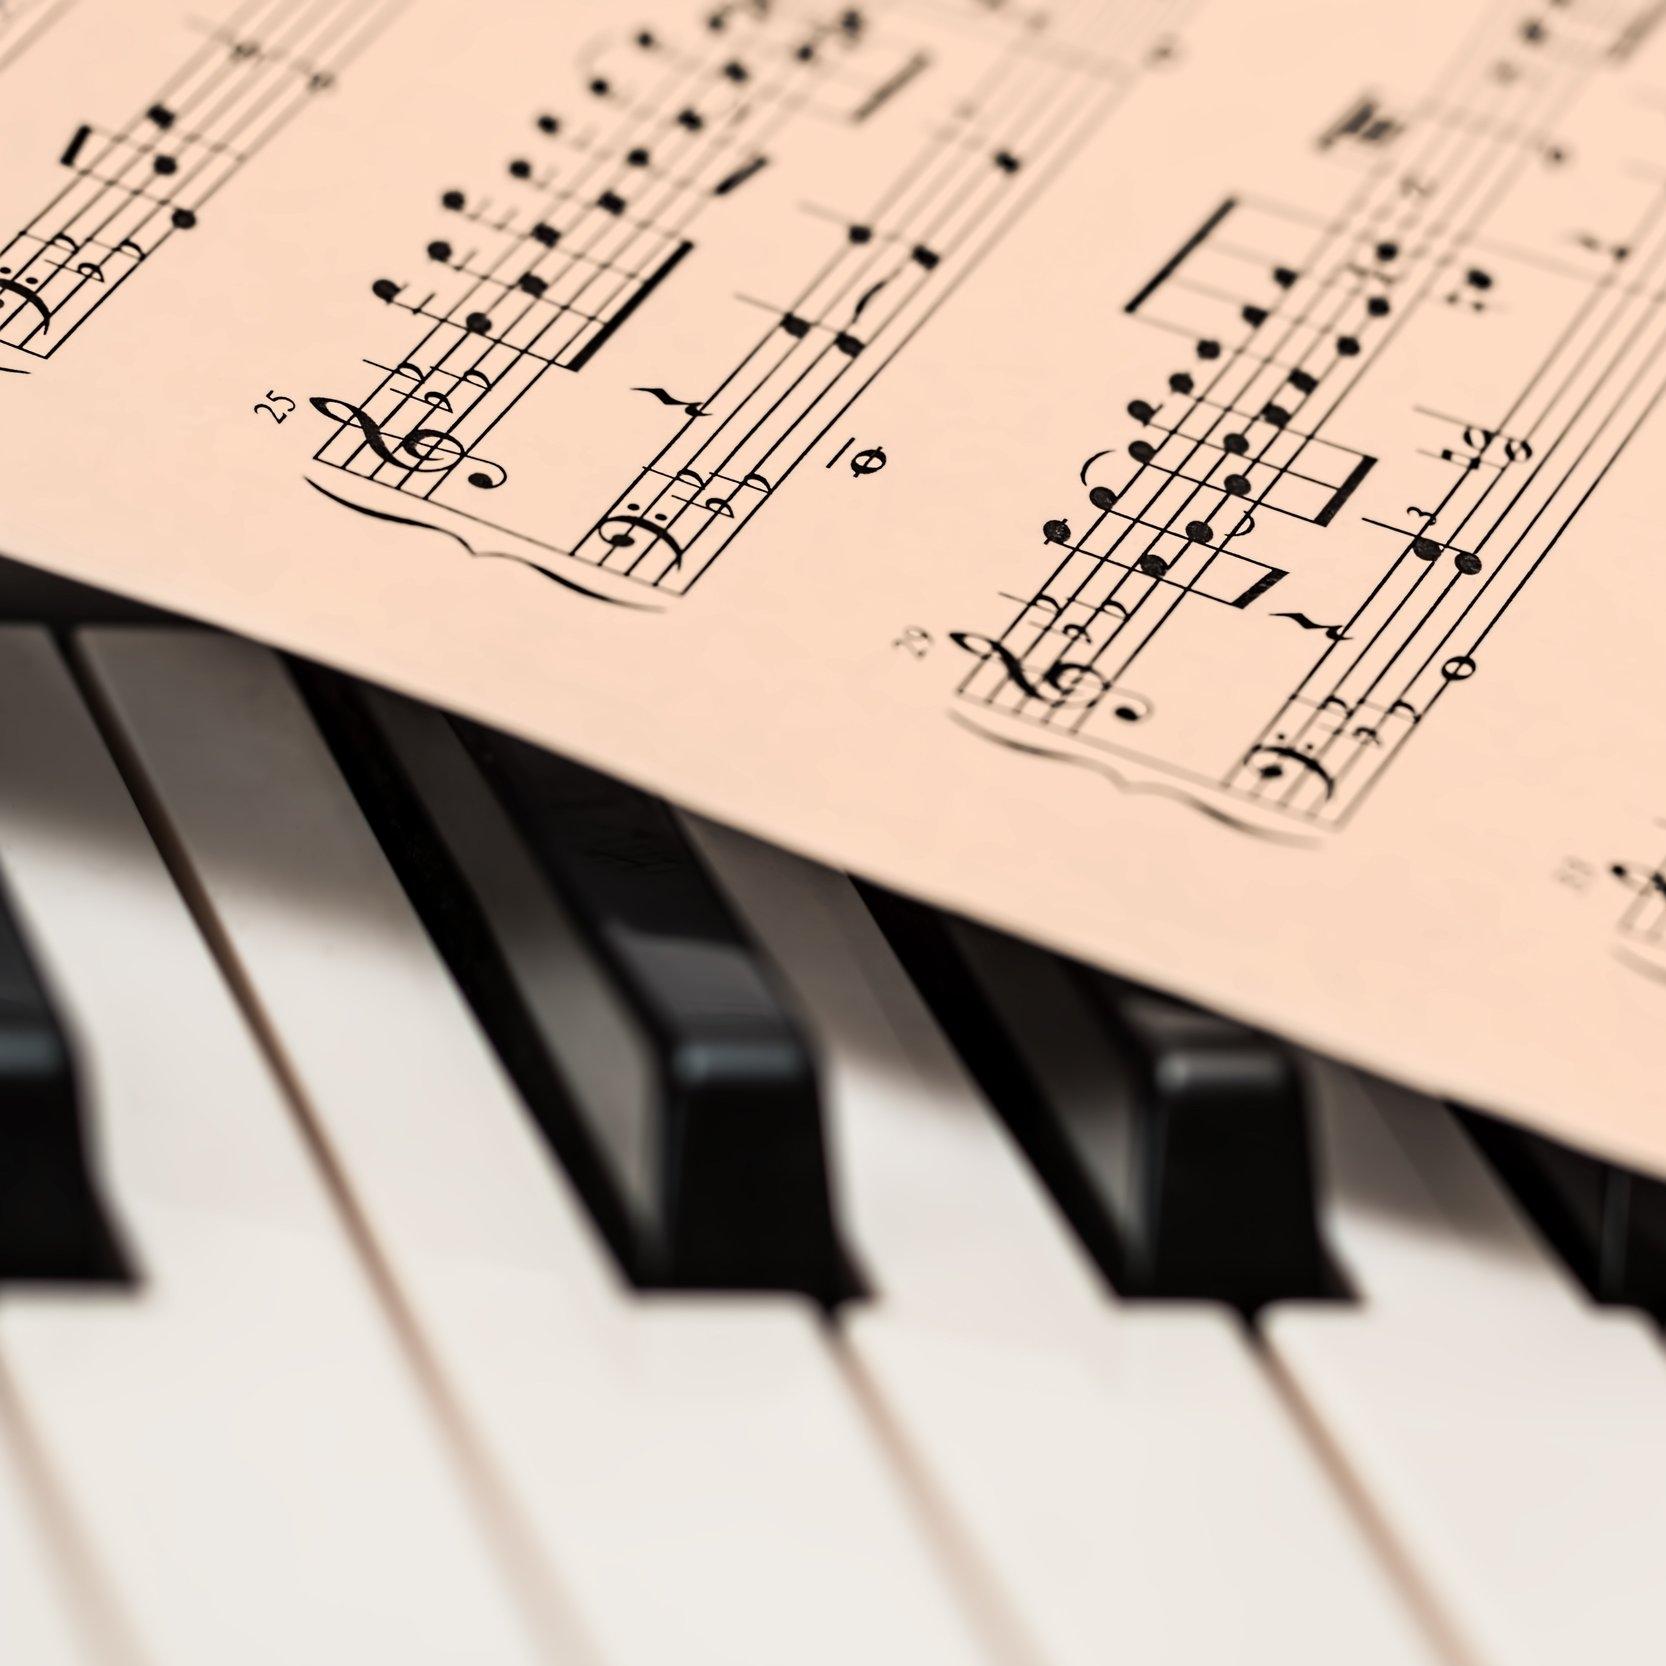 keyboard-music-sheet-musical-instrument-210764.jpg